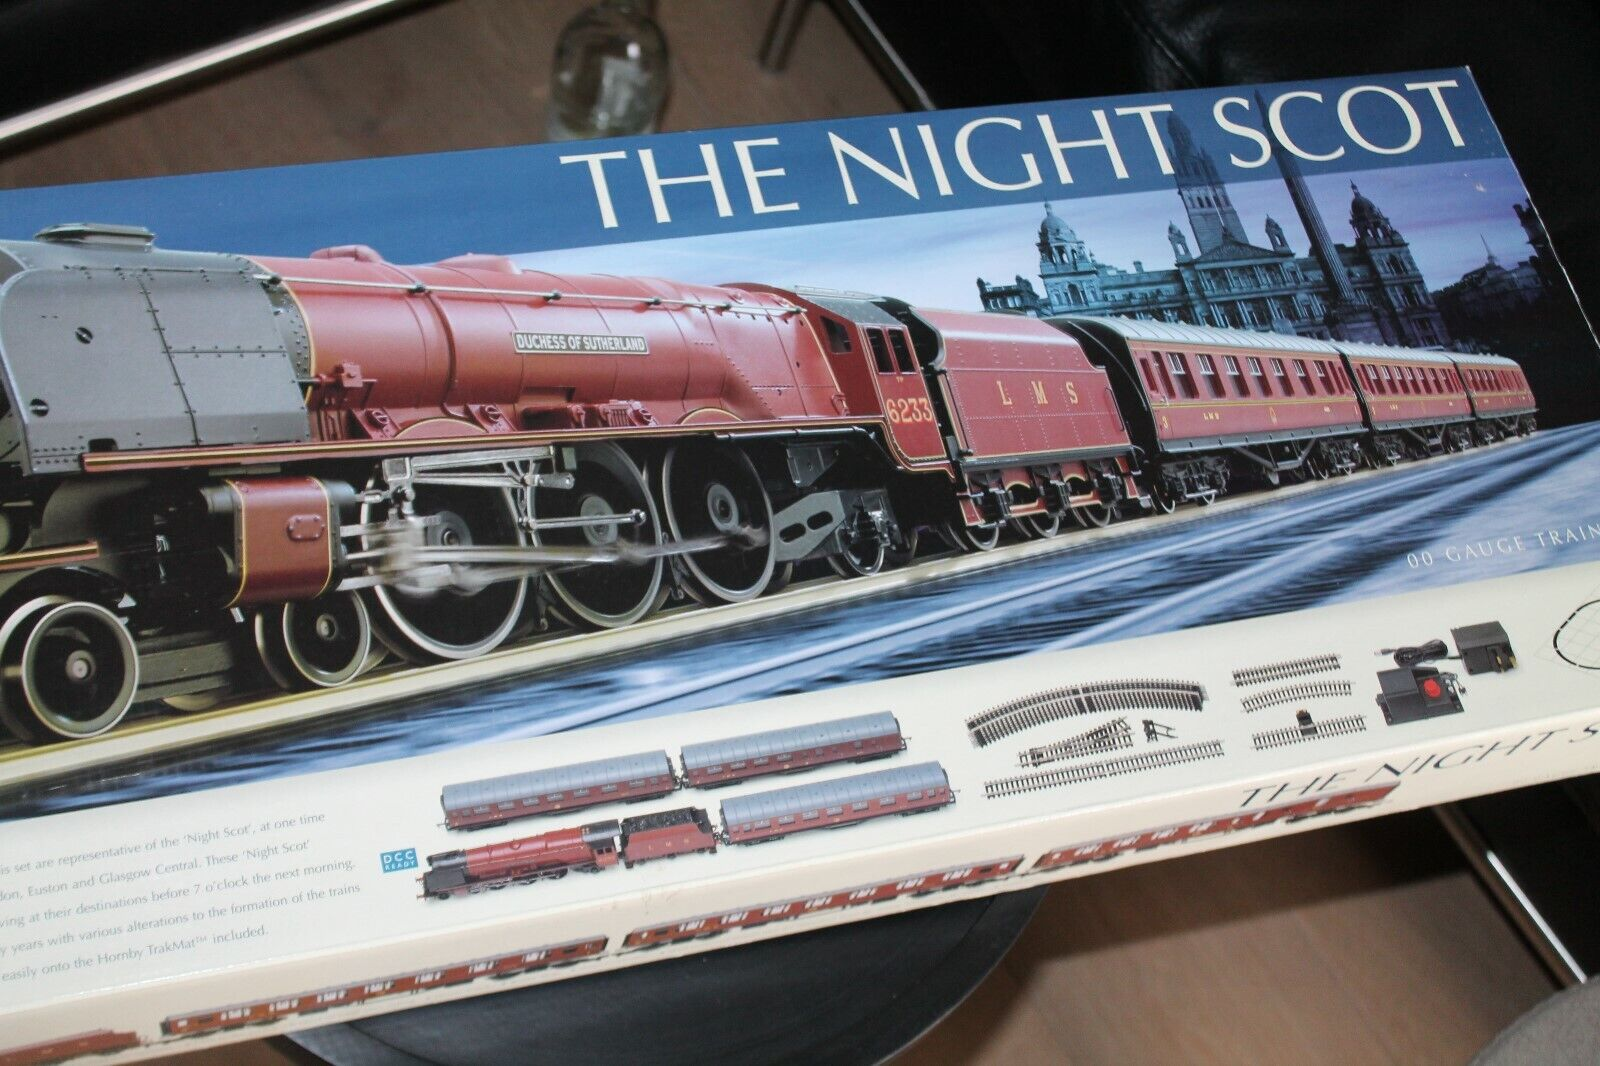 Hornby r1104  The Night scot  Duchess class Train set  embalaje original  oo